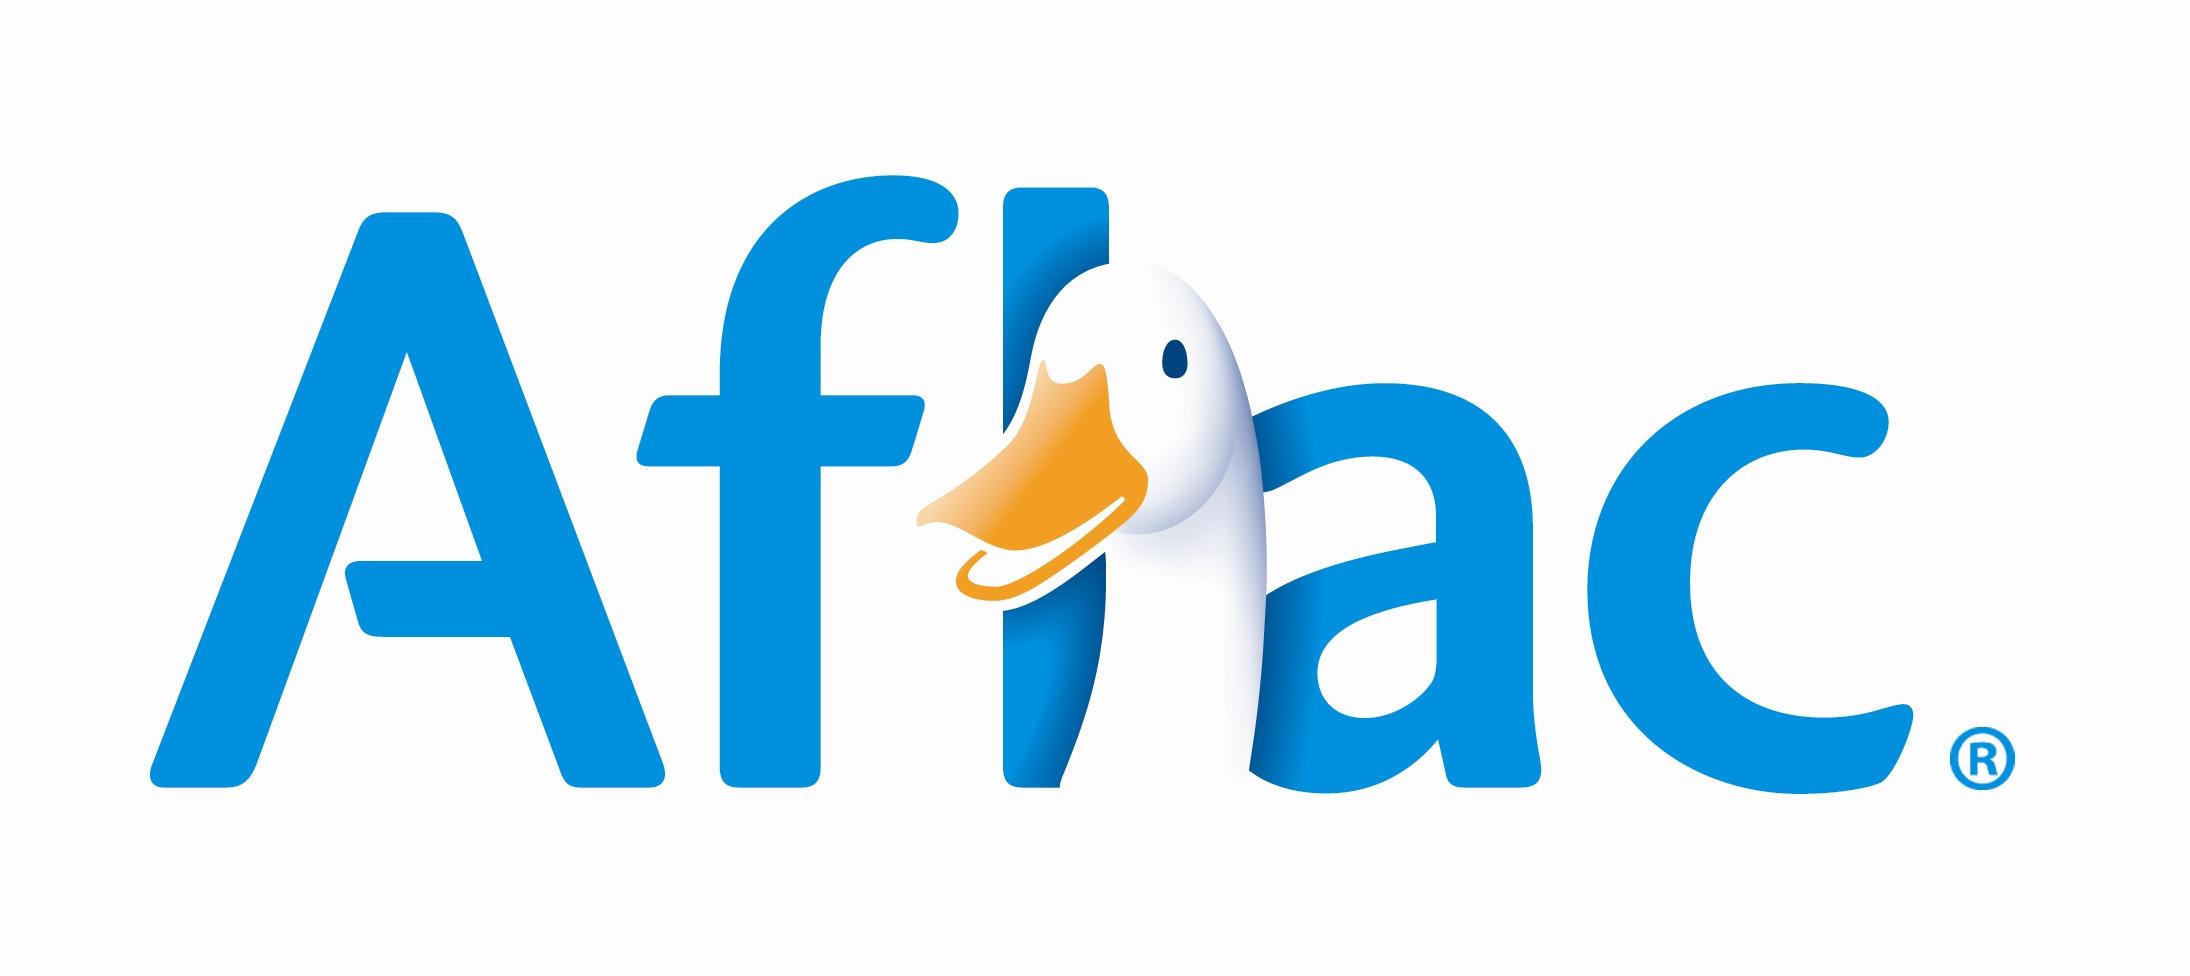 aflac_logo-1